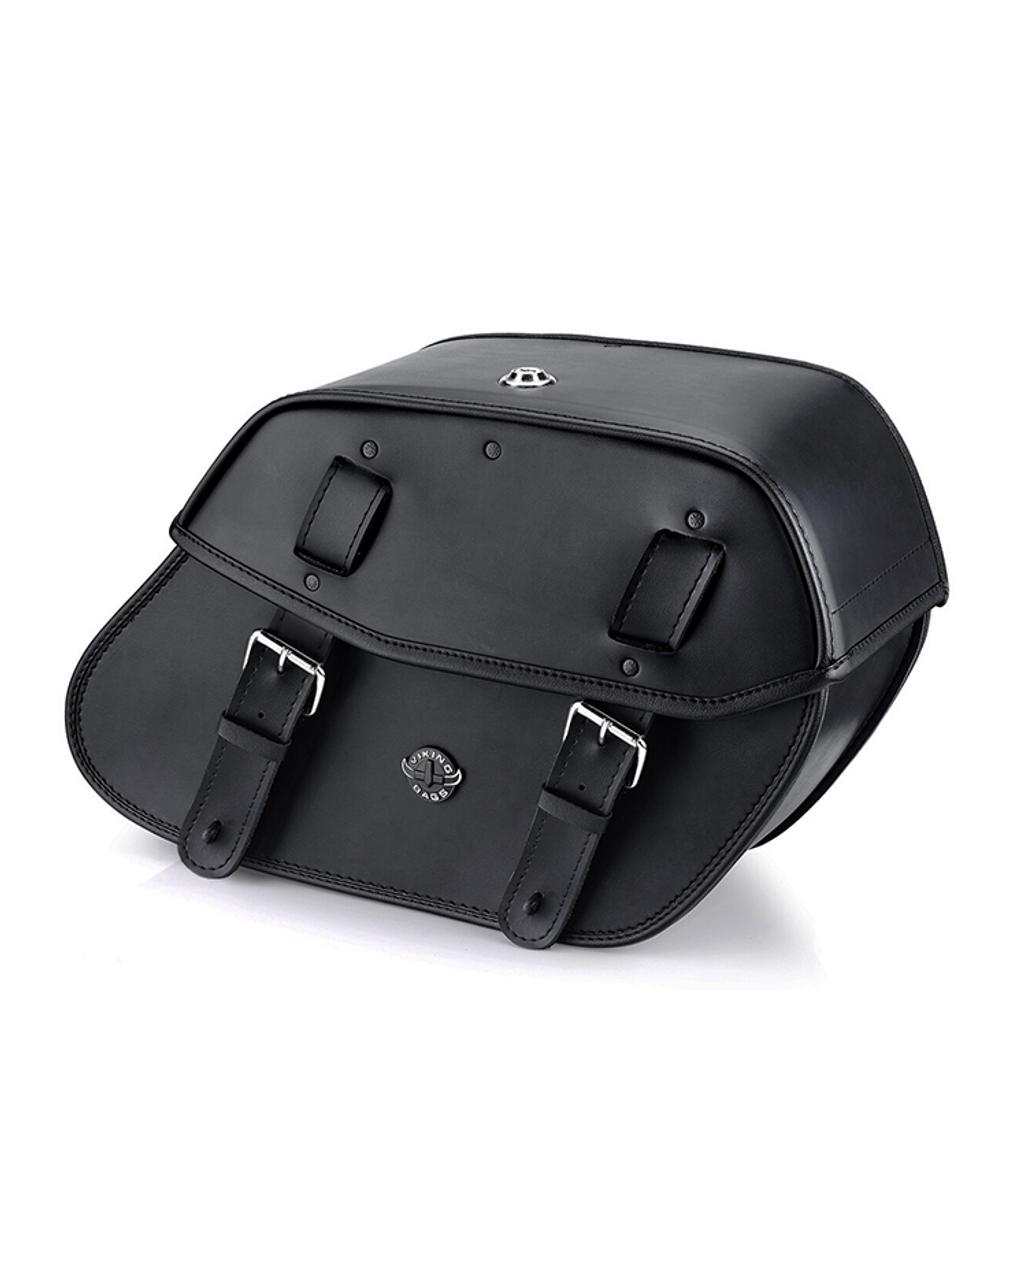 Viking Odin Medium Motorcycle Saddlebags For Harley Softail Springer FXSTS Main Bag View